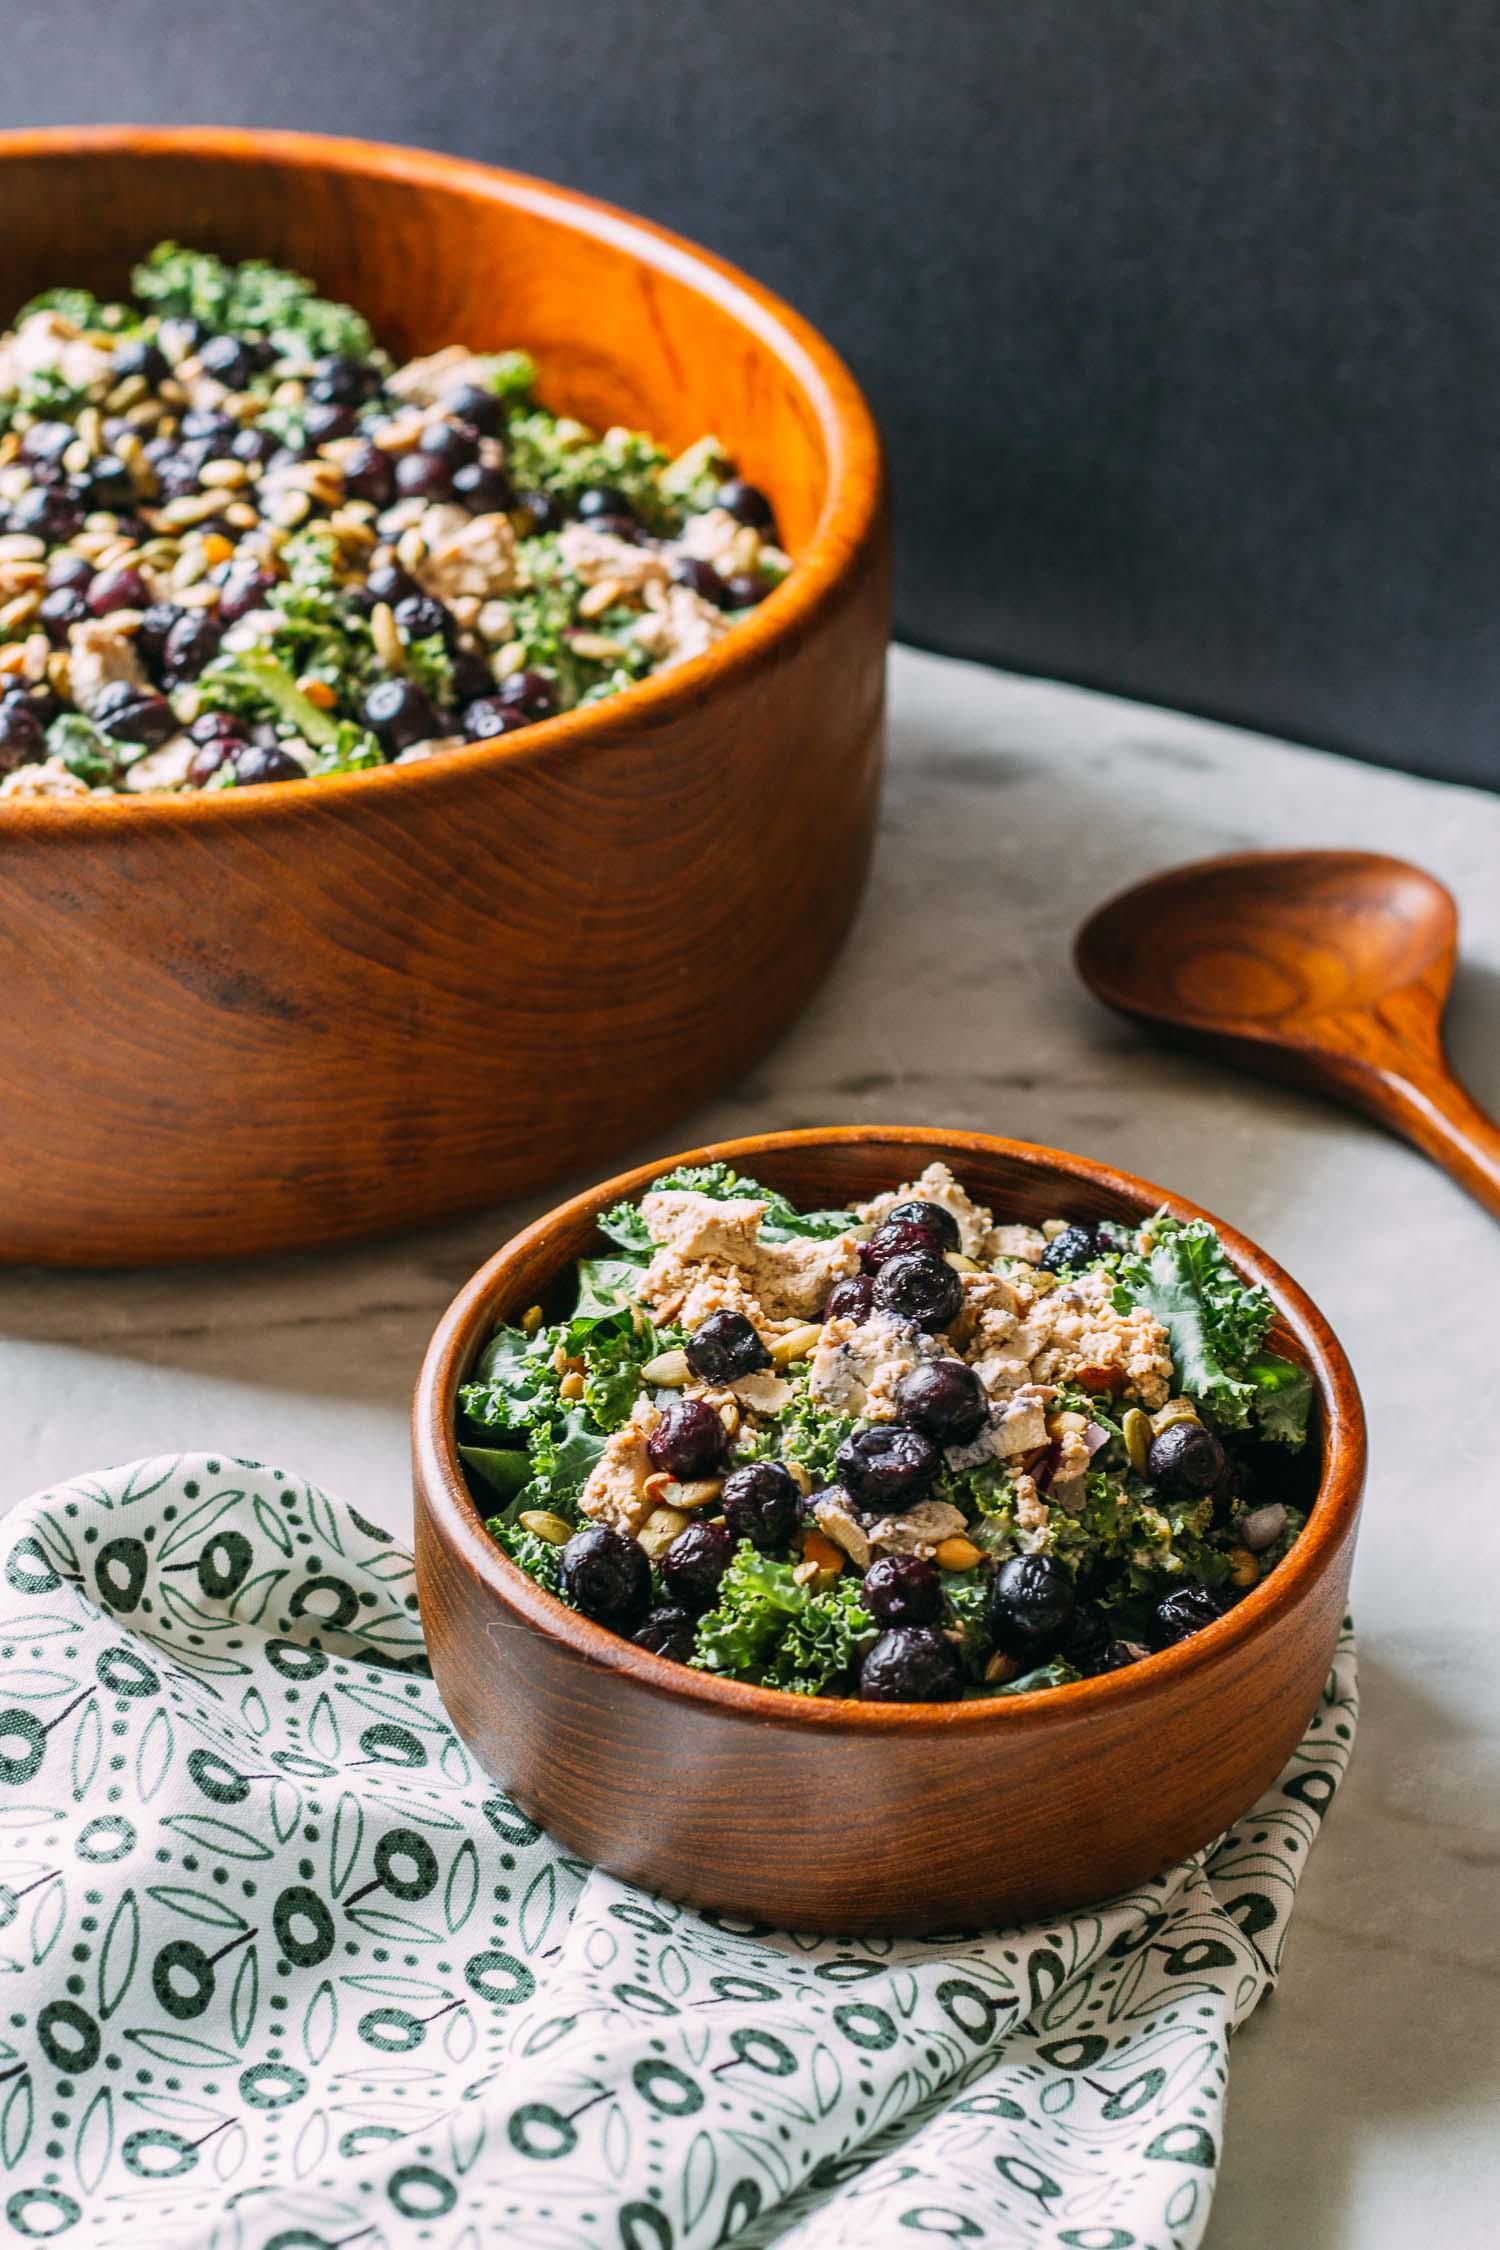 Blueberry Kale Pumpkin Seed Salad #plant-based #vegan #kale #salad #recipe #tofu #protein #gluten-free